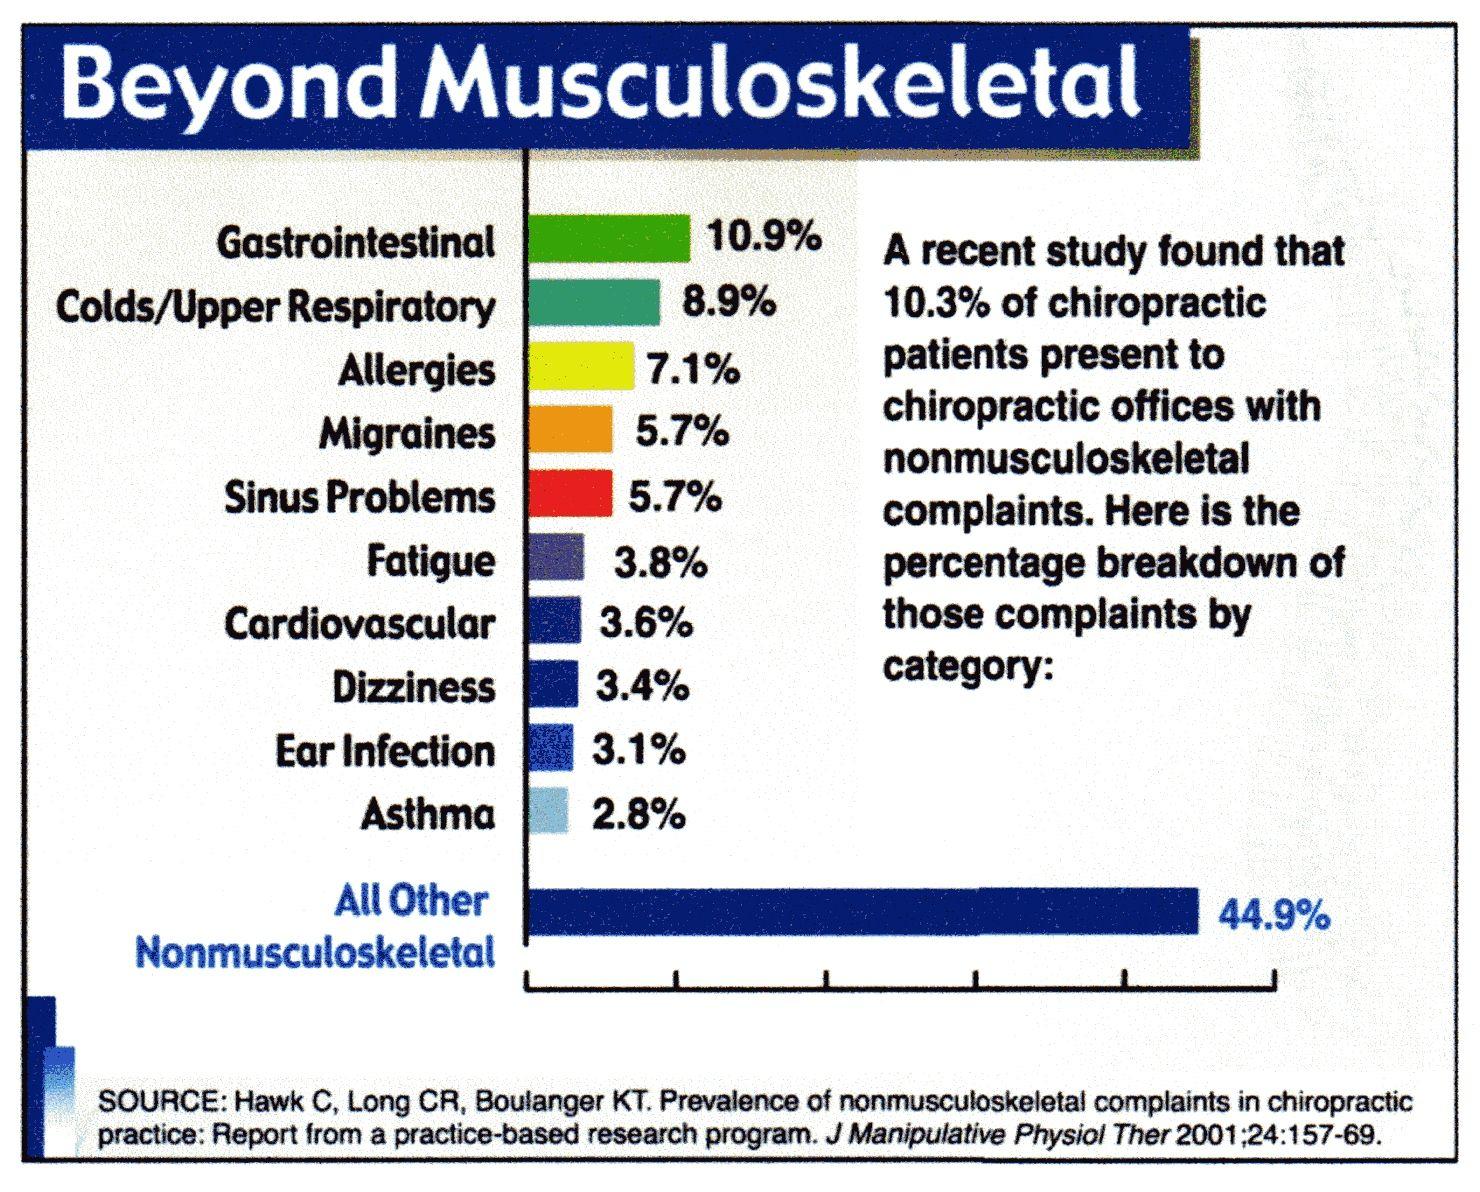 Beyond musculoskeletal sinus problems chiropractic